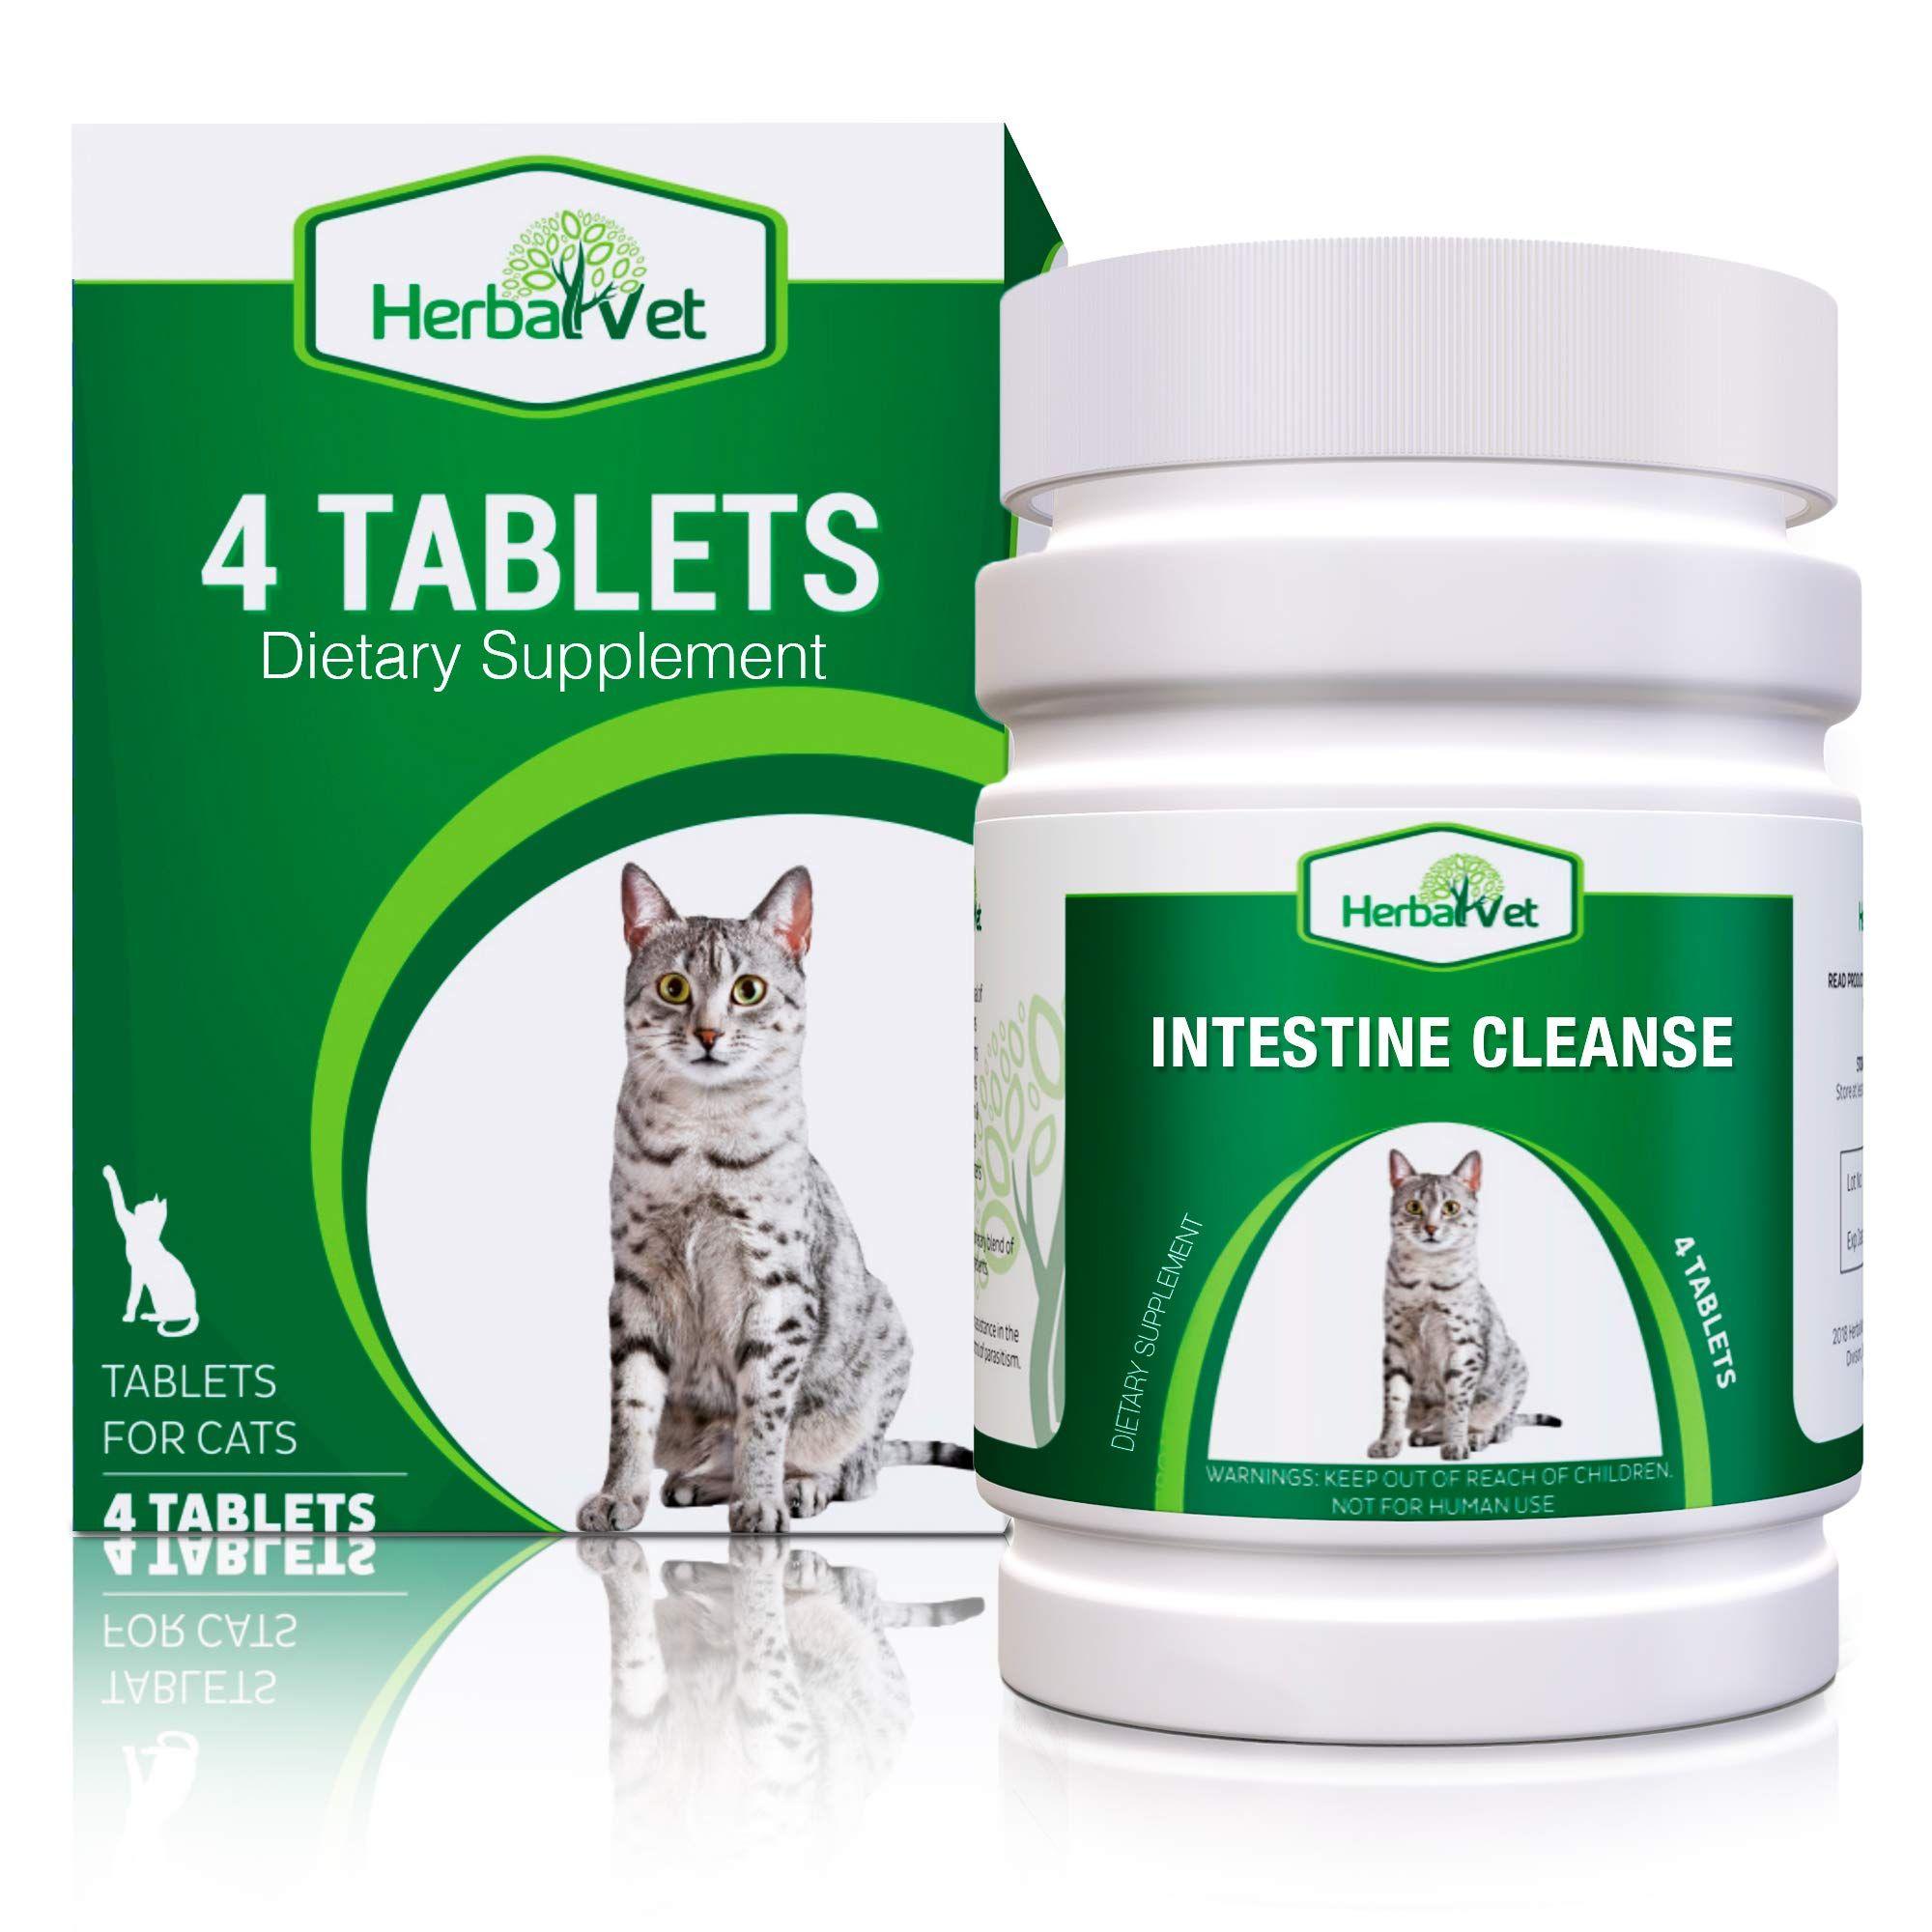 Herbalvet 10 tablets cat intestinal cleanse cat dewormer